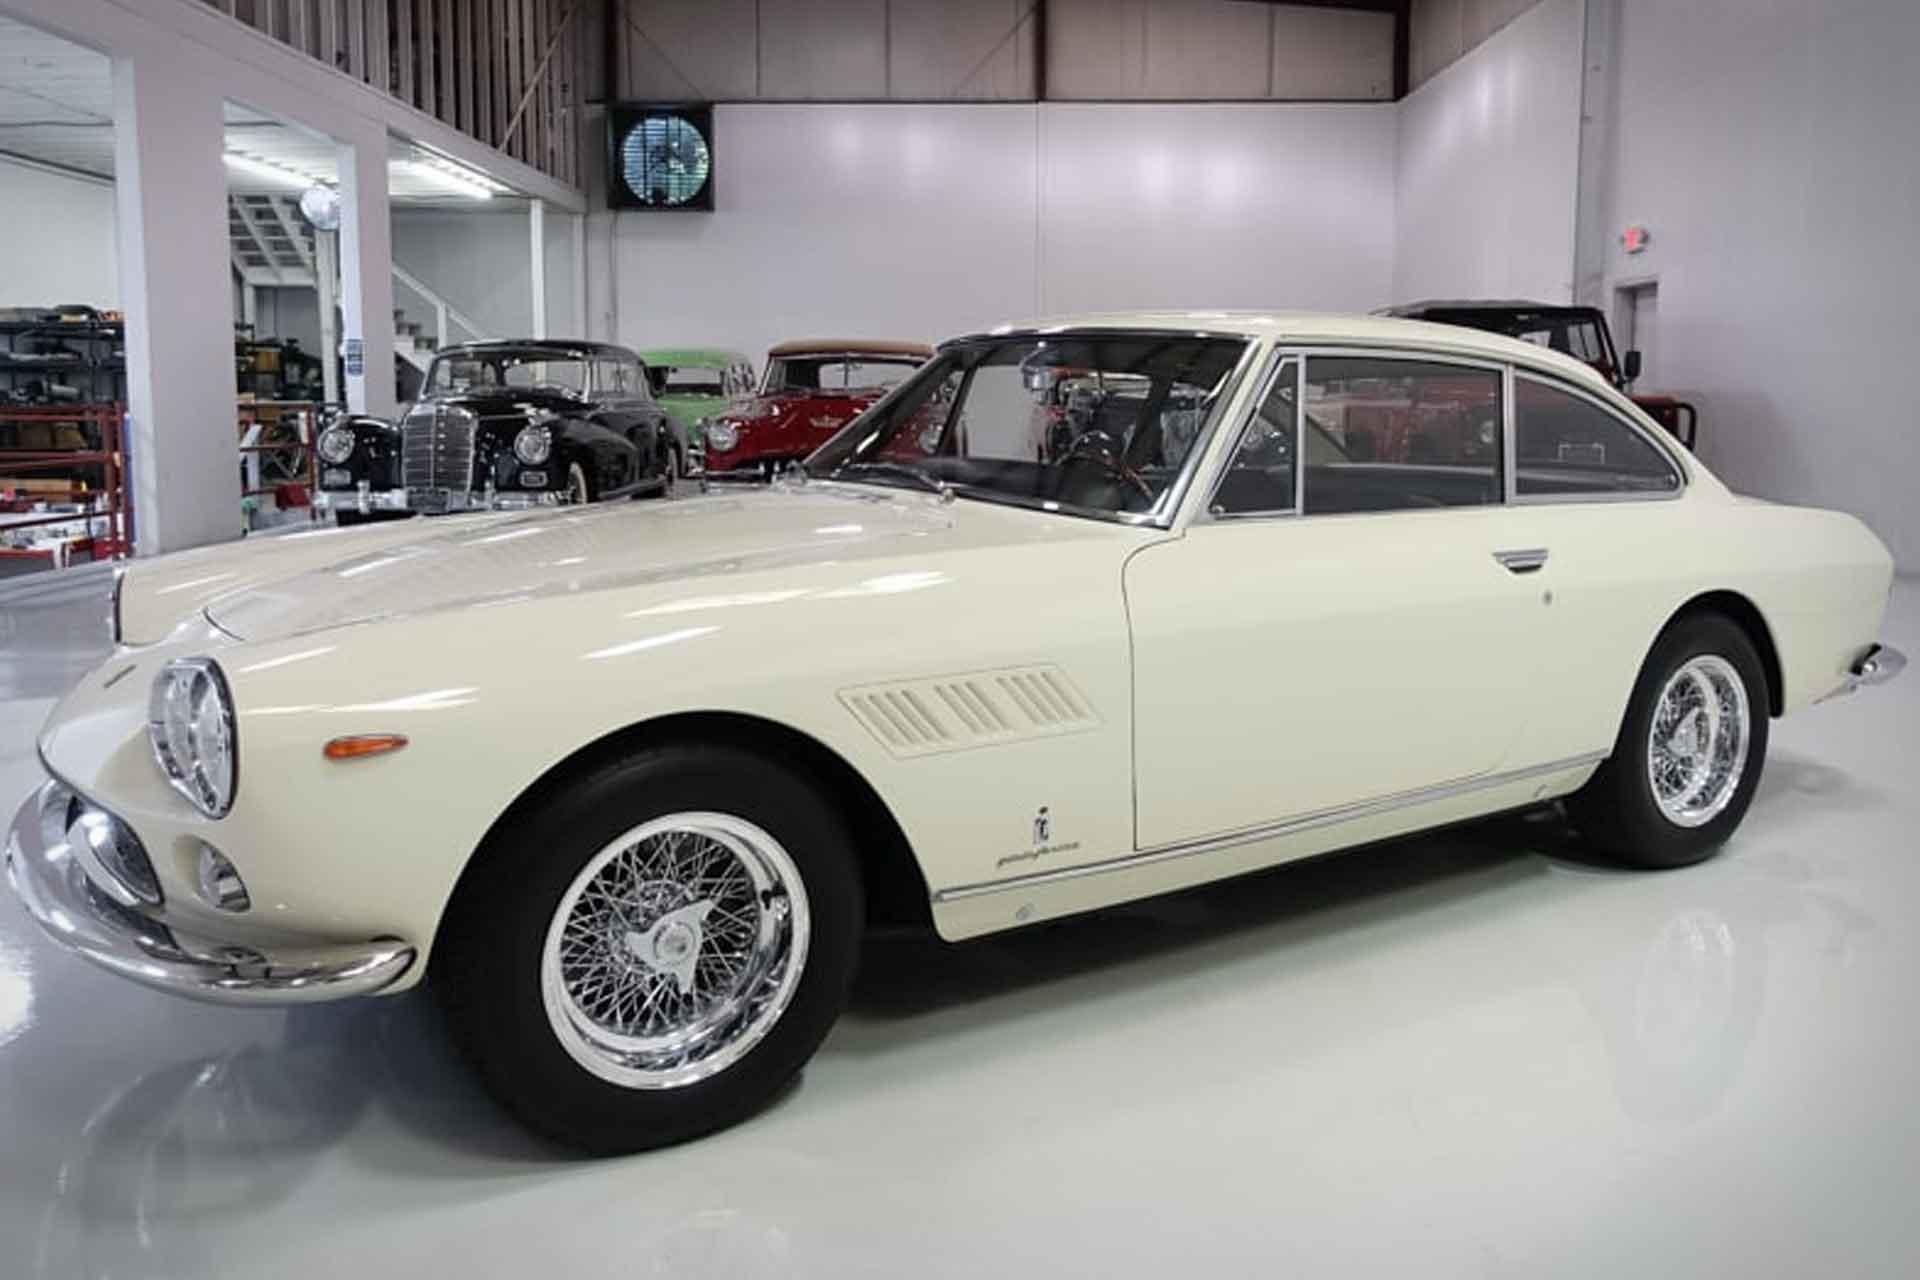 Enzo Ferrari's 1962 330 GT Coupe